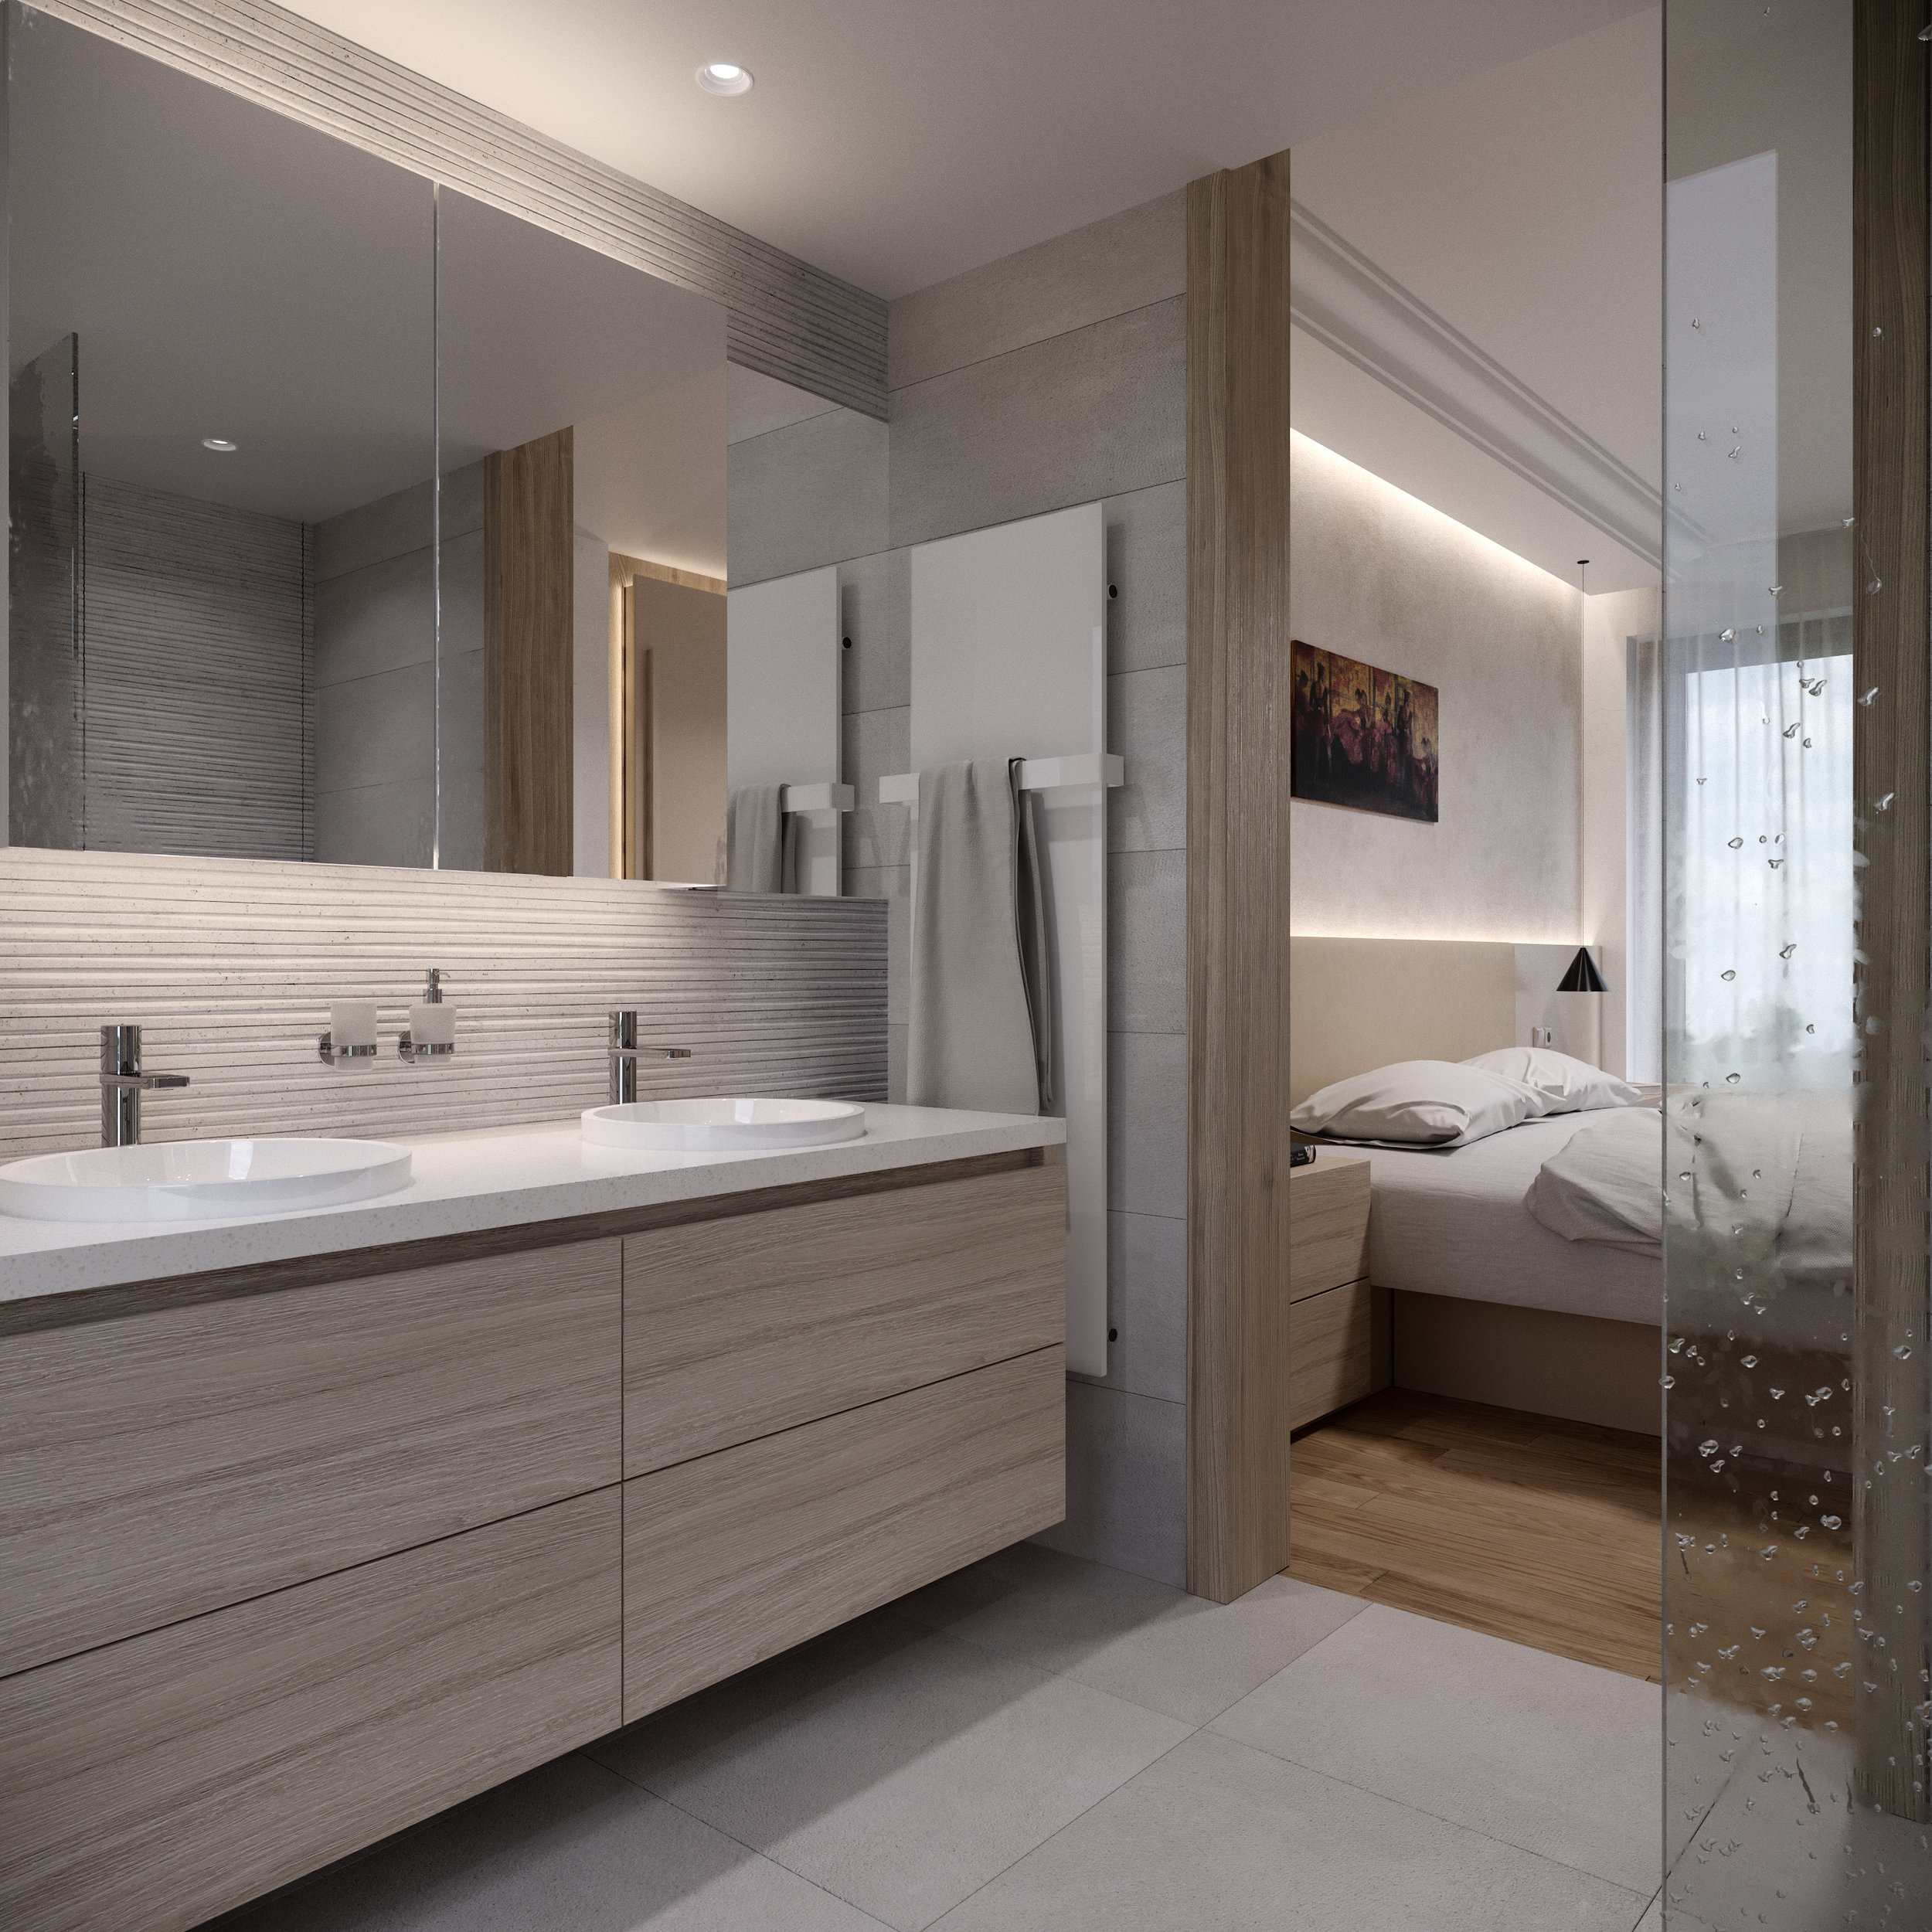 Bathroom_01_F.jpg